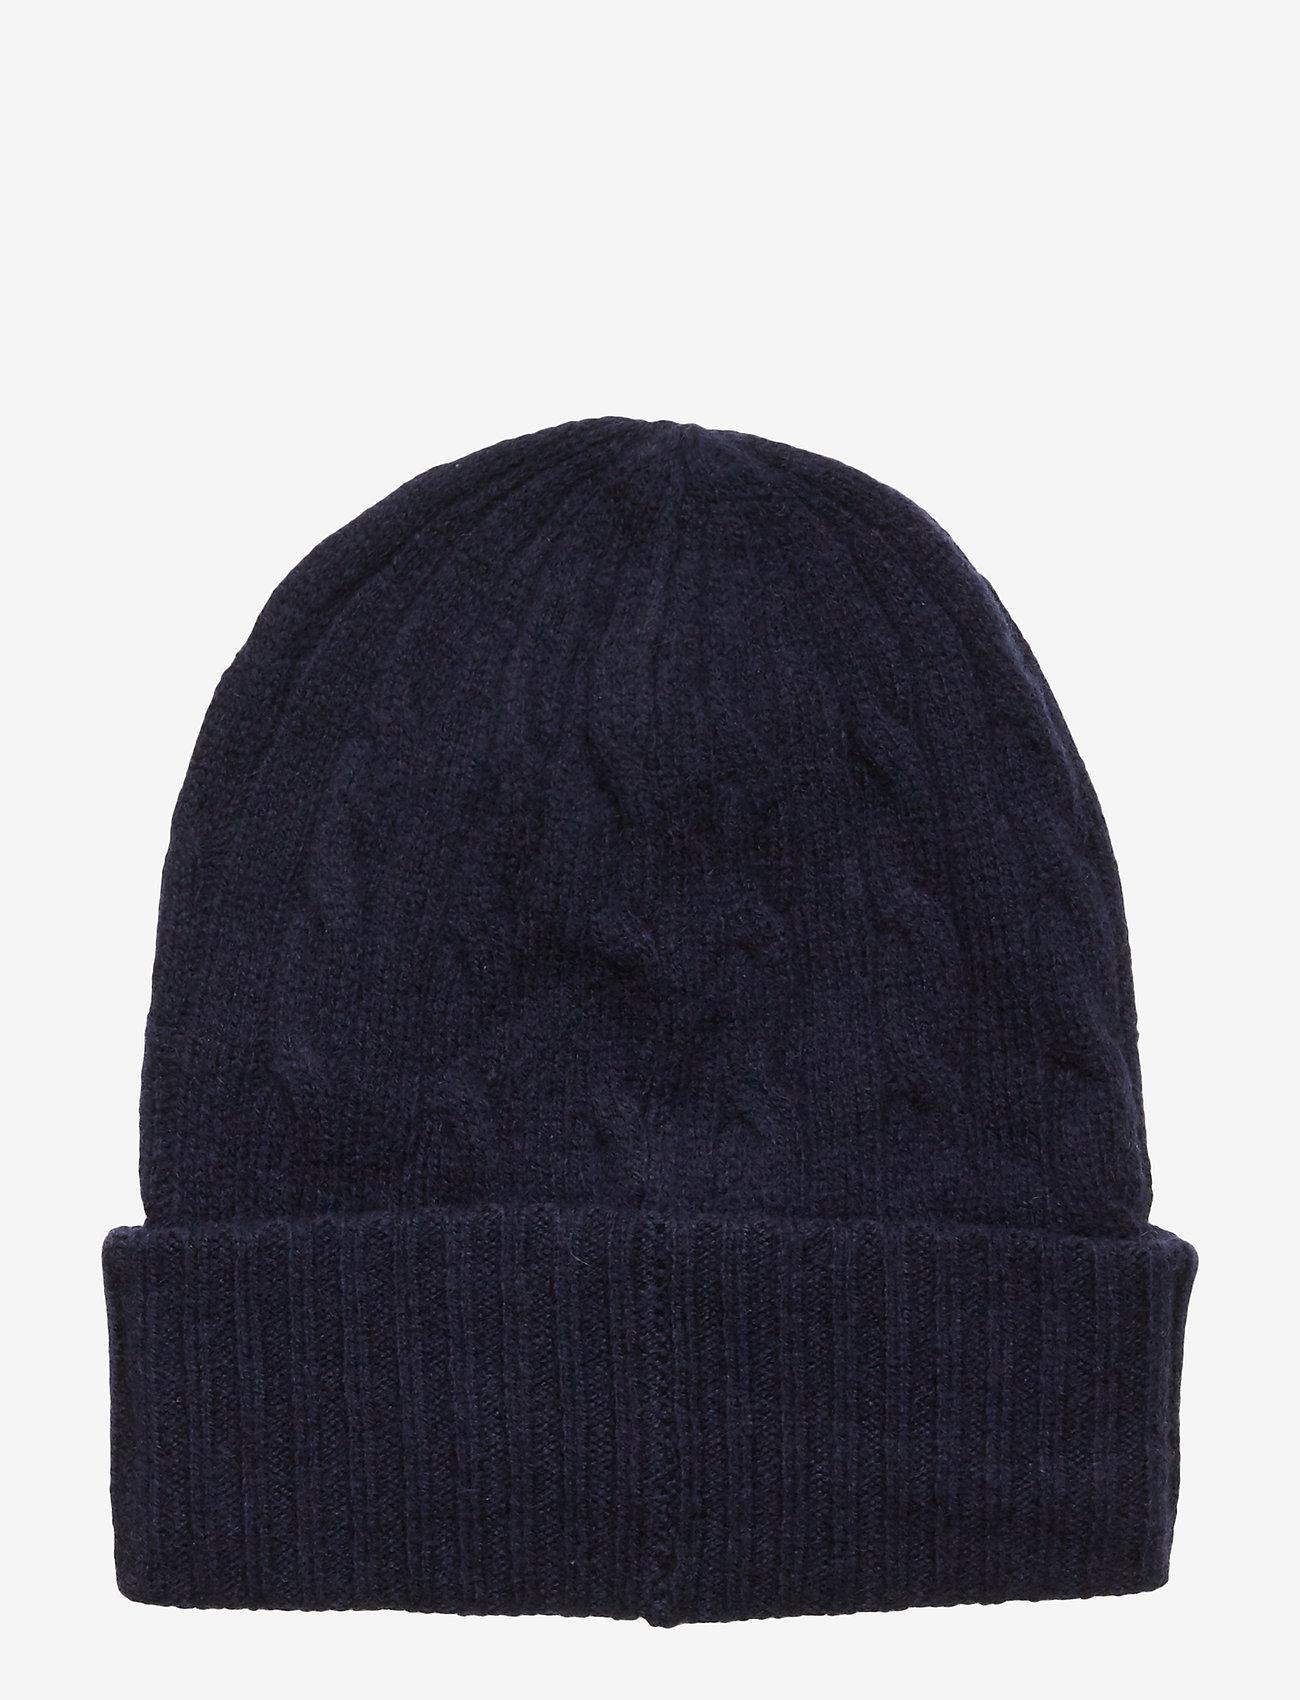 Polo Ralph Lauren Wool/cashmere-cable-hat - Mössor & Kepsar Navy